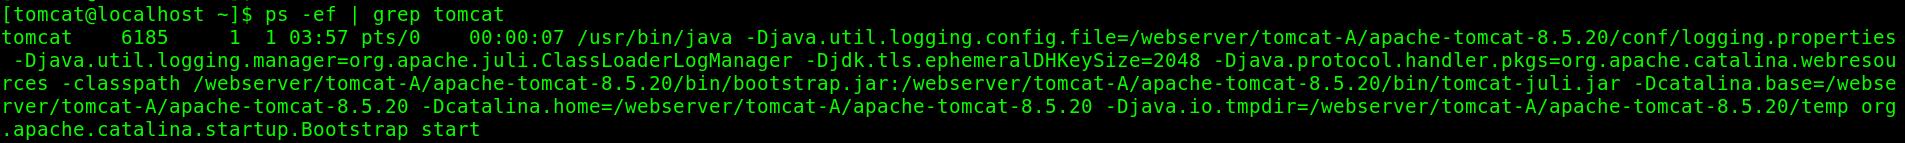 tomcat_installation_6